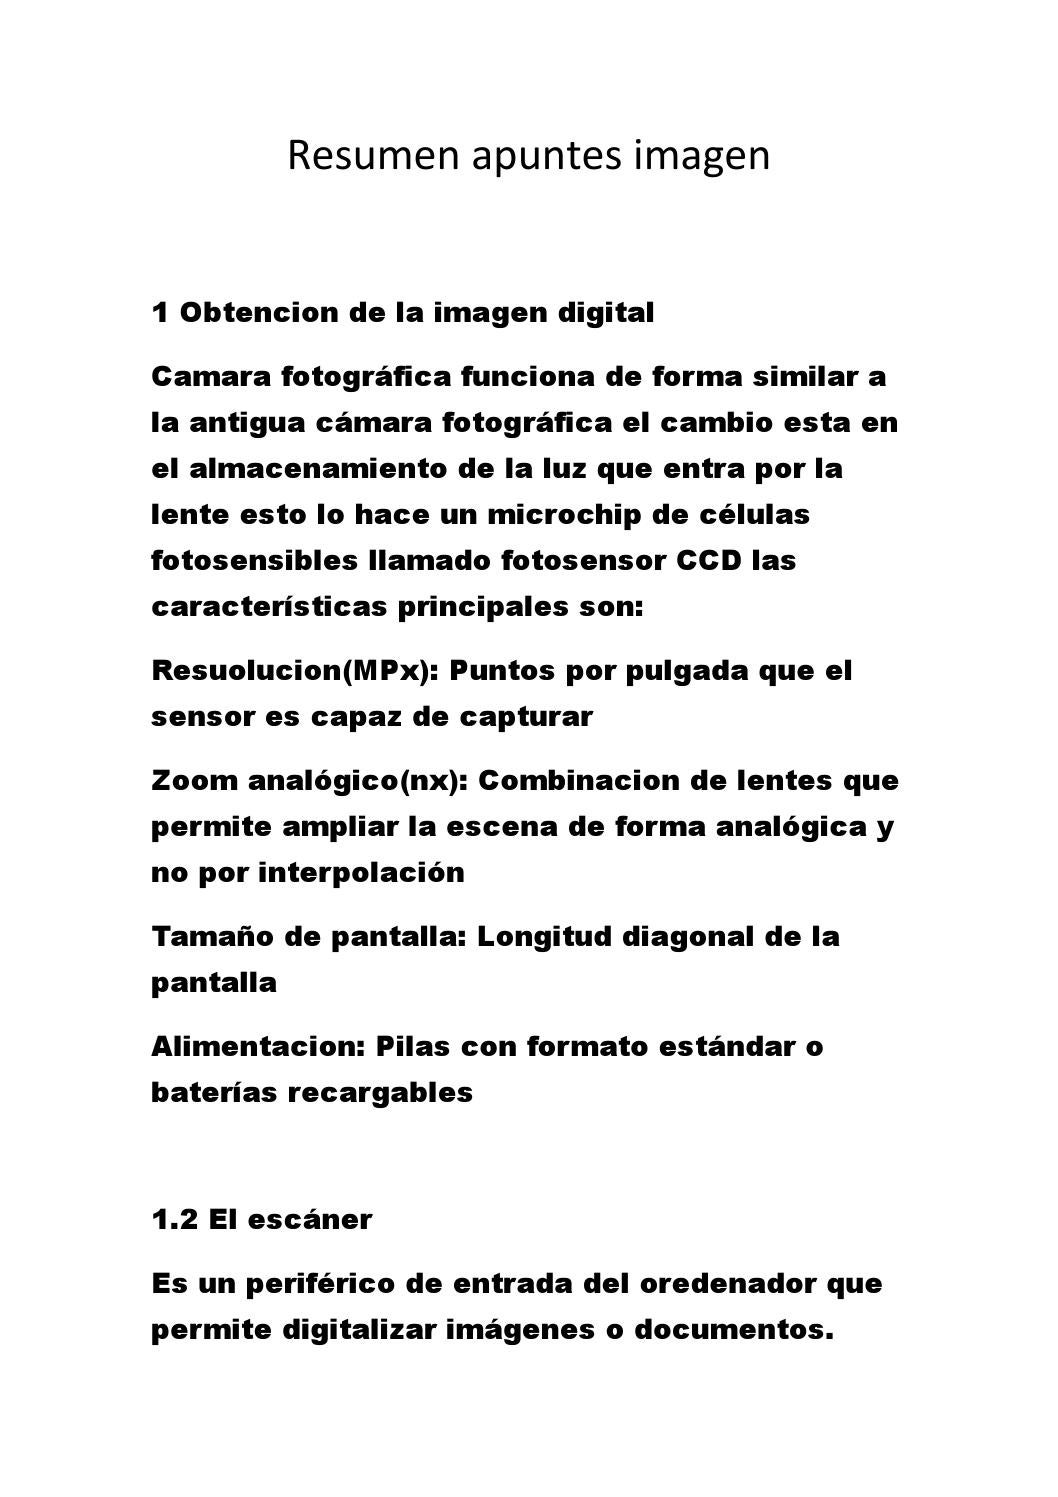 Resumen apuntes imagen by Unai Herrero - issuu